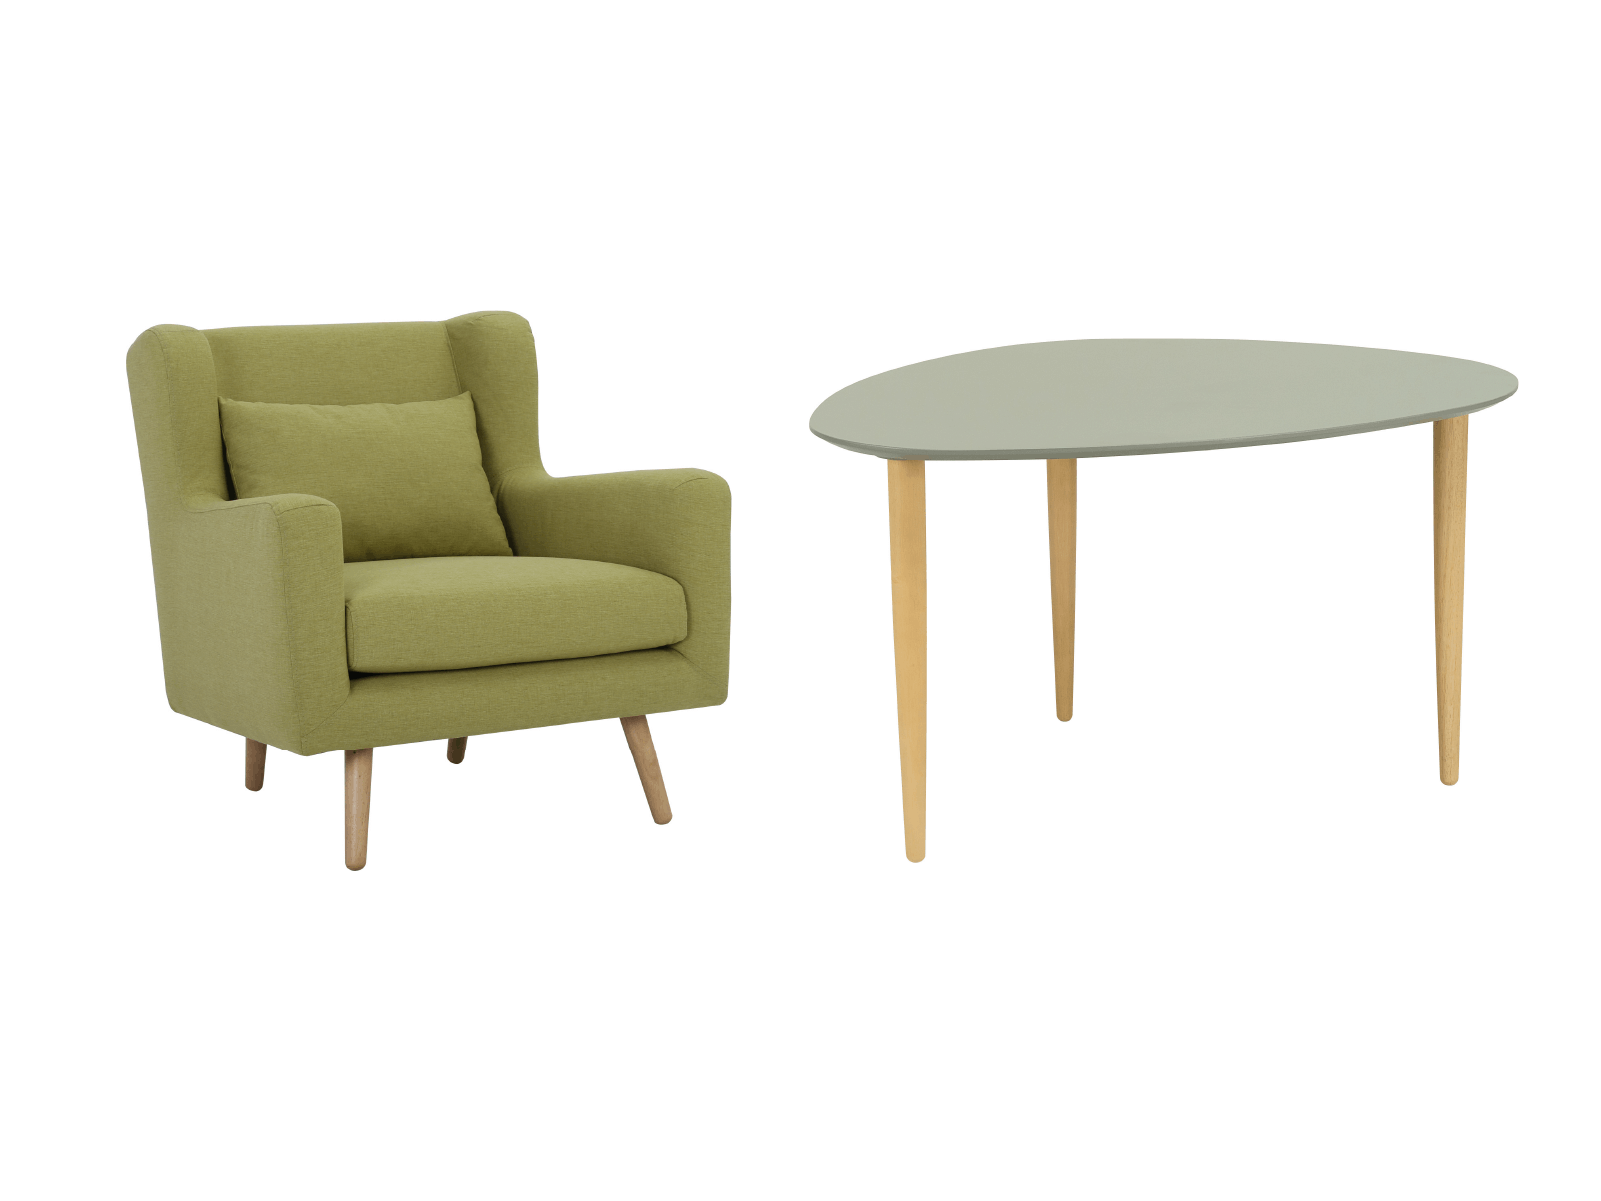 Safari Single Seater With High Table Set@2x